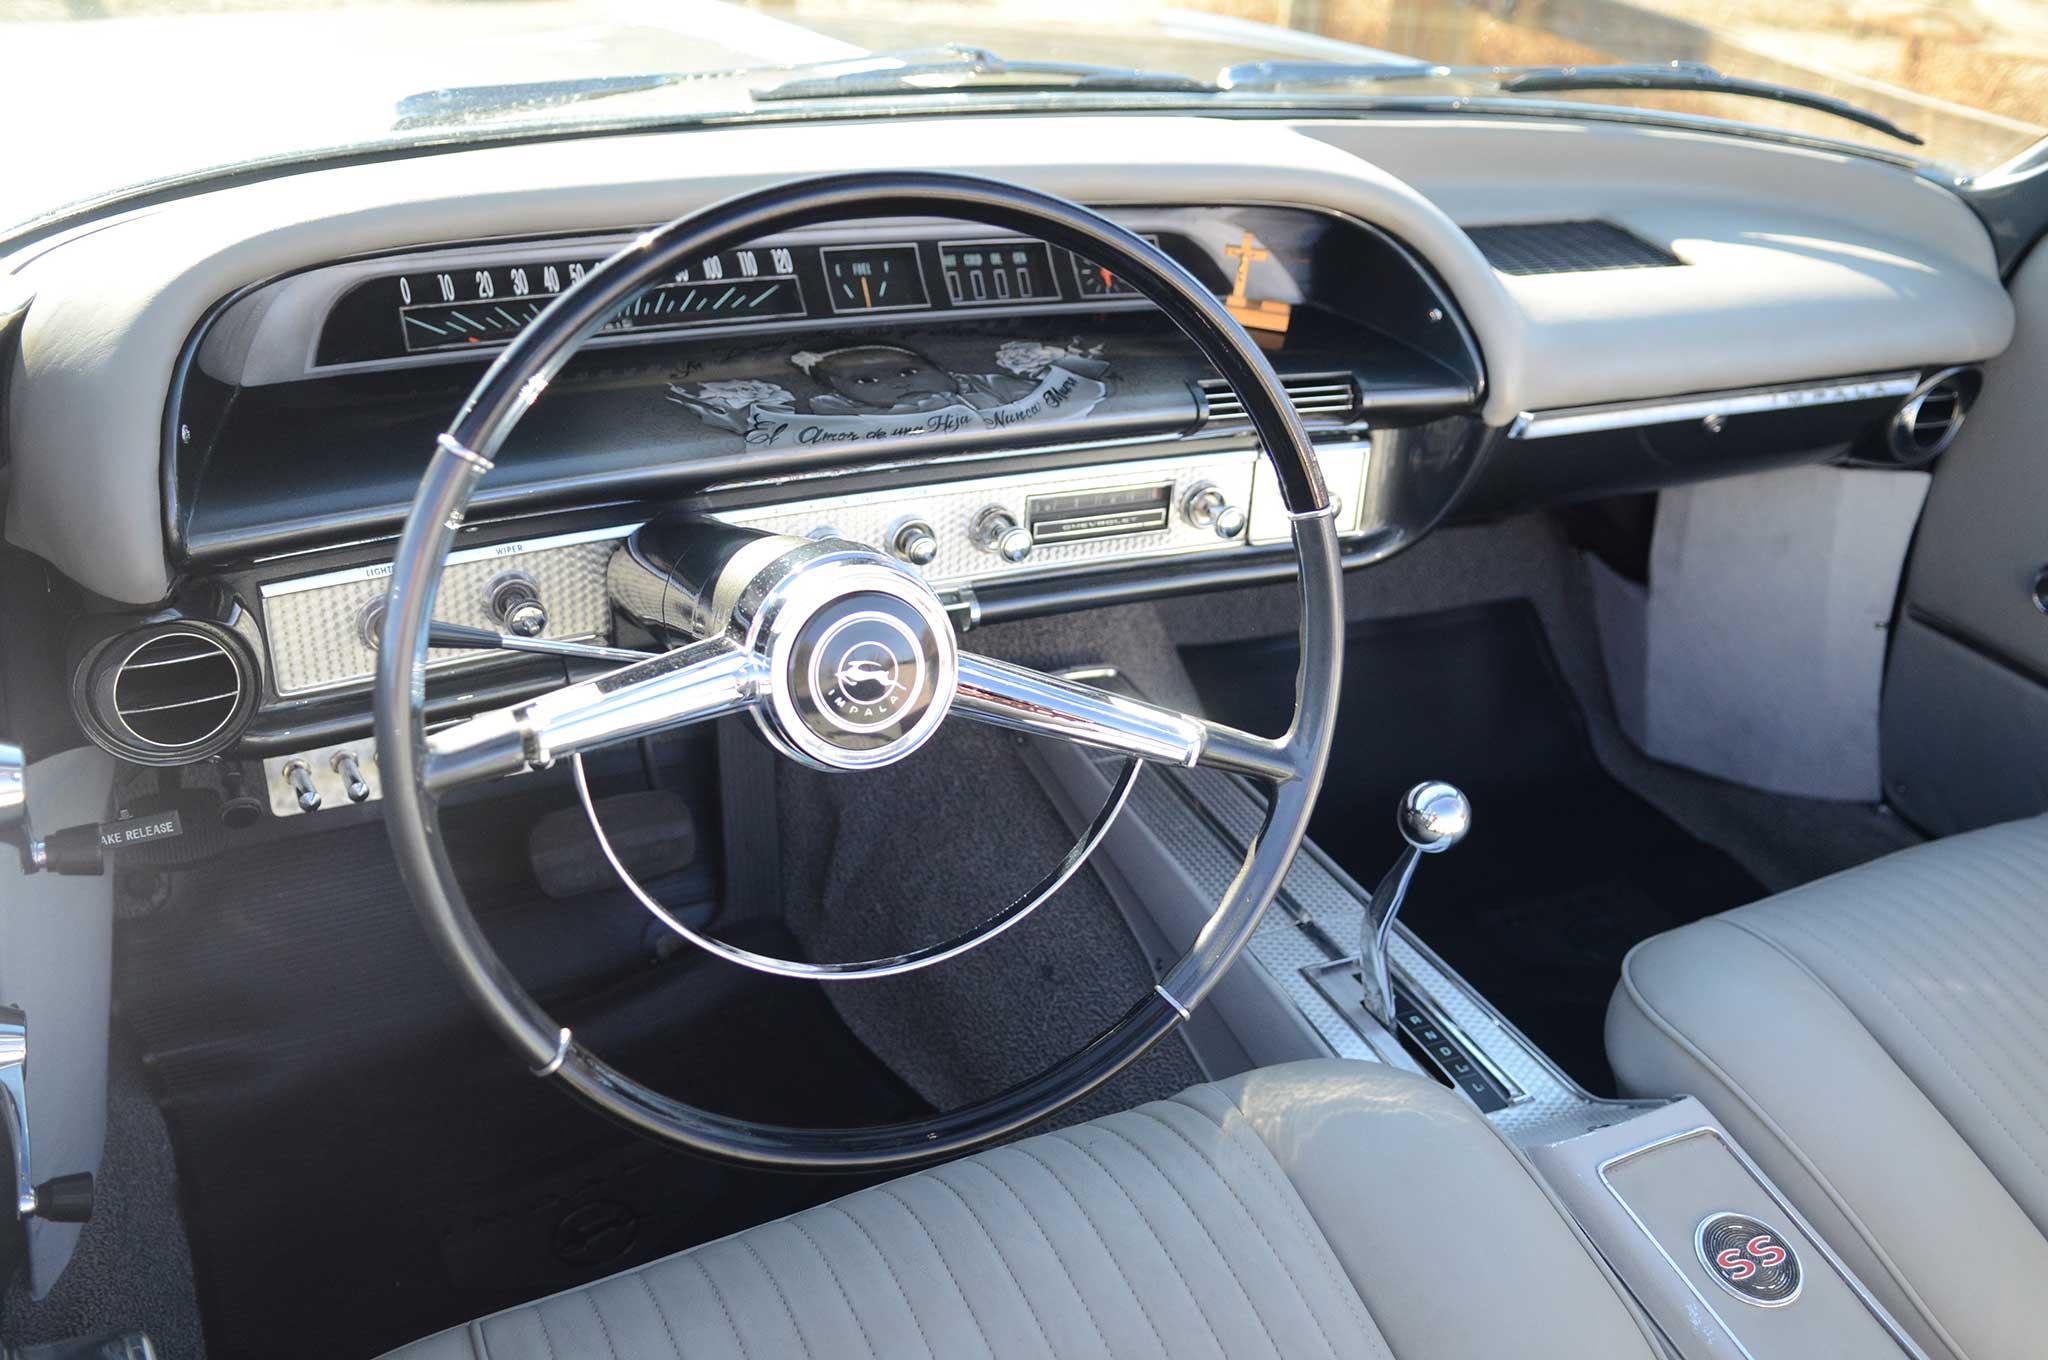 Rebuilding a 1964 Chevrolet Impala SS Convertible